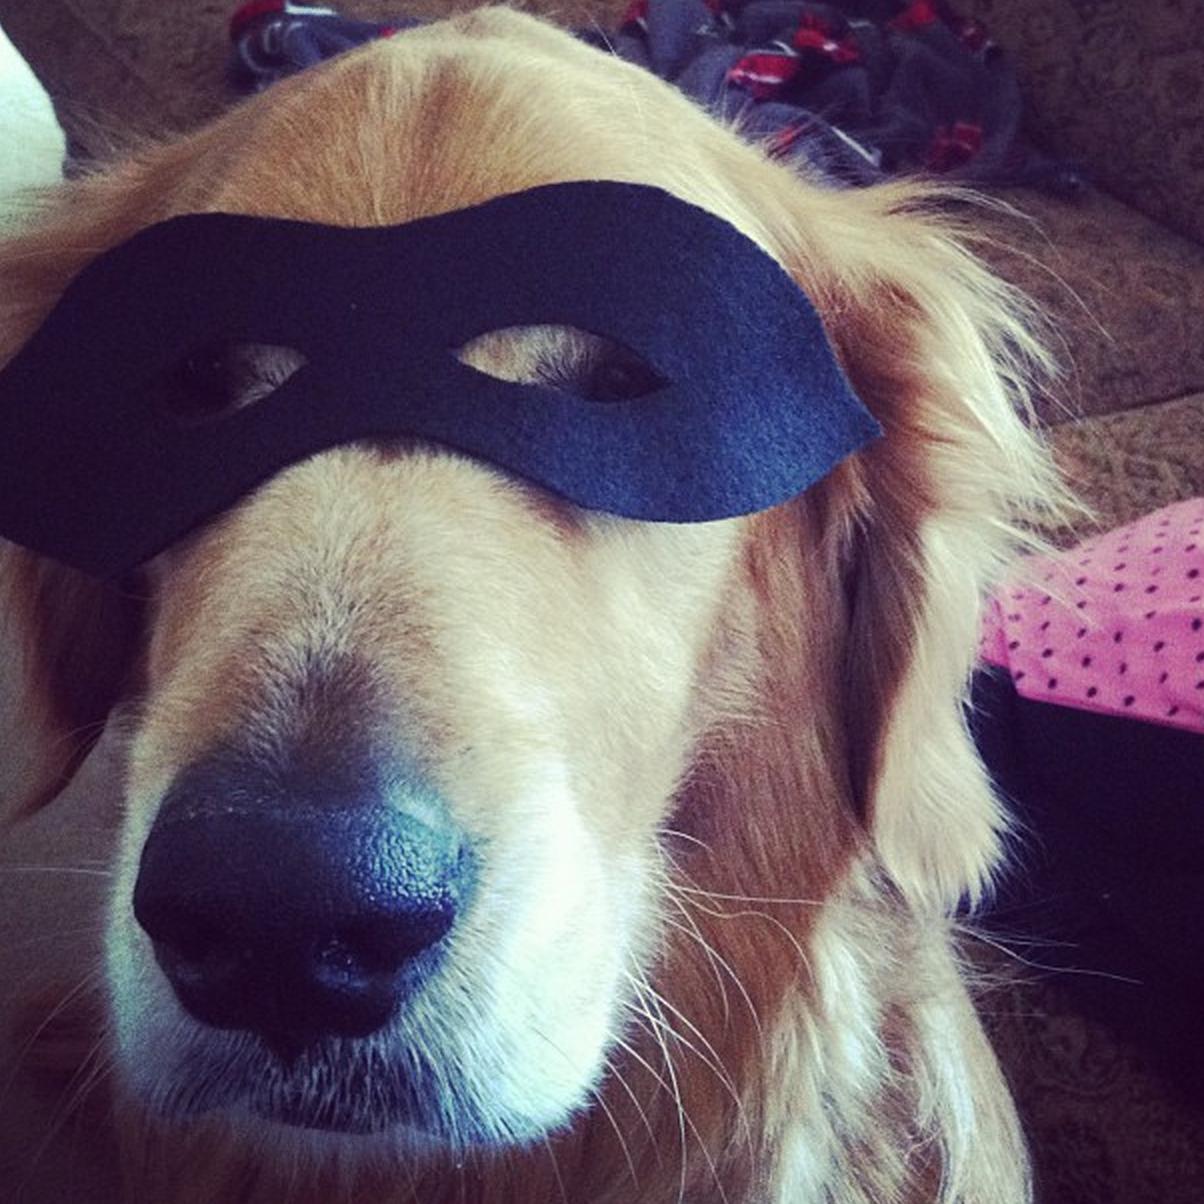 superhero mask inspiredrd.com